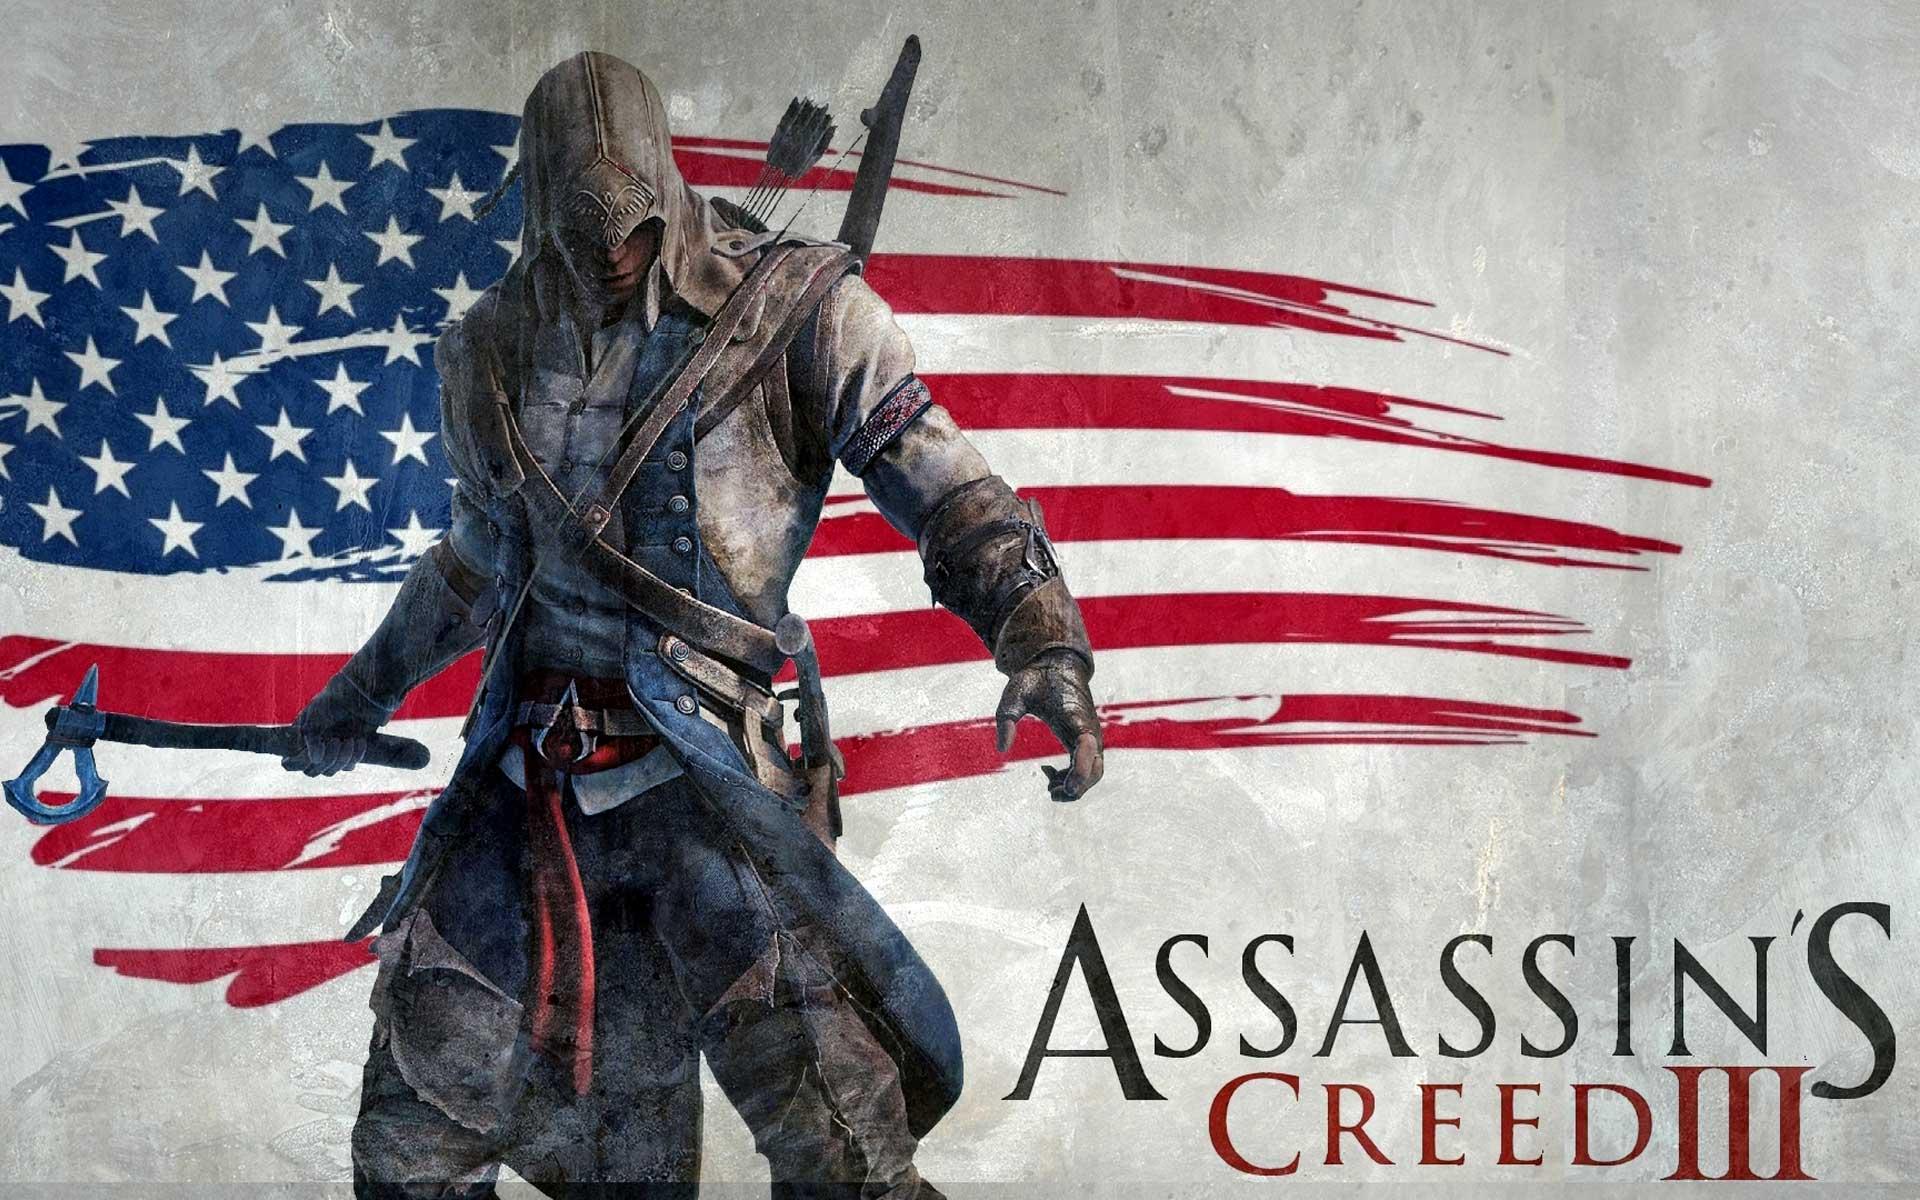 Preview Assassin's Creed Rogue - V roli lovce asasínů 9747